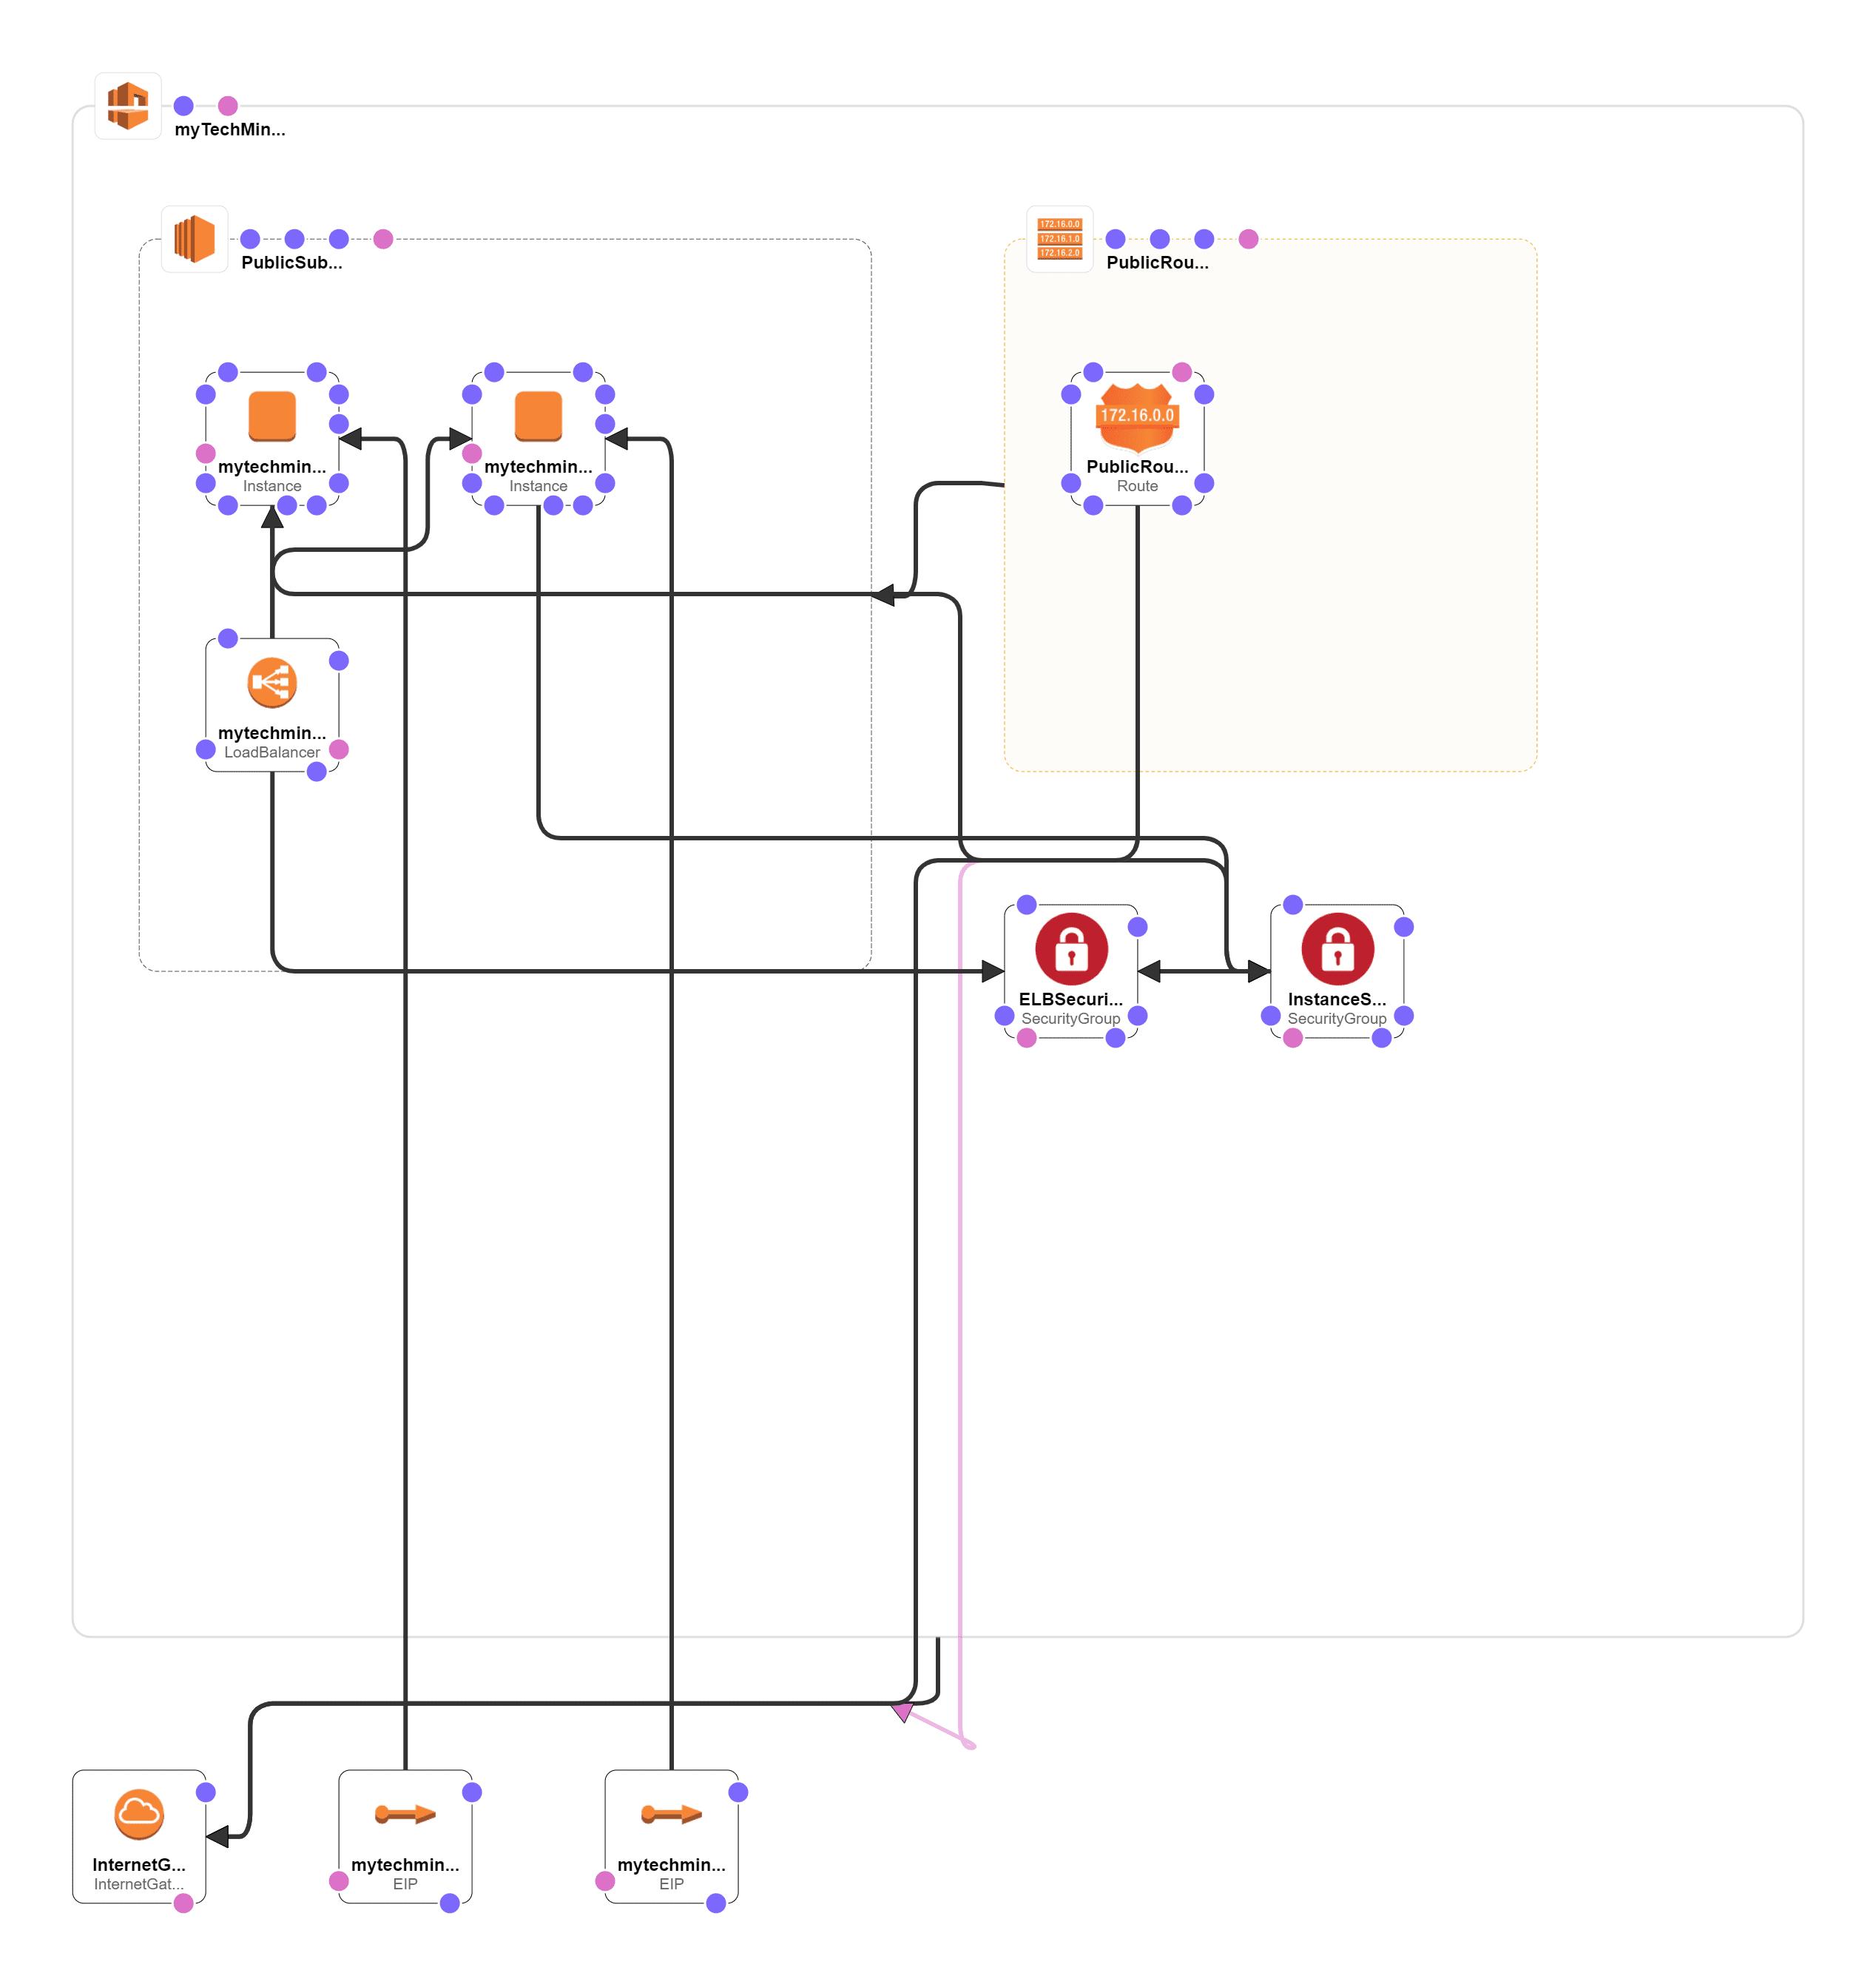 cft-template-design-mytechmint